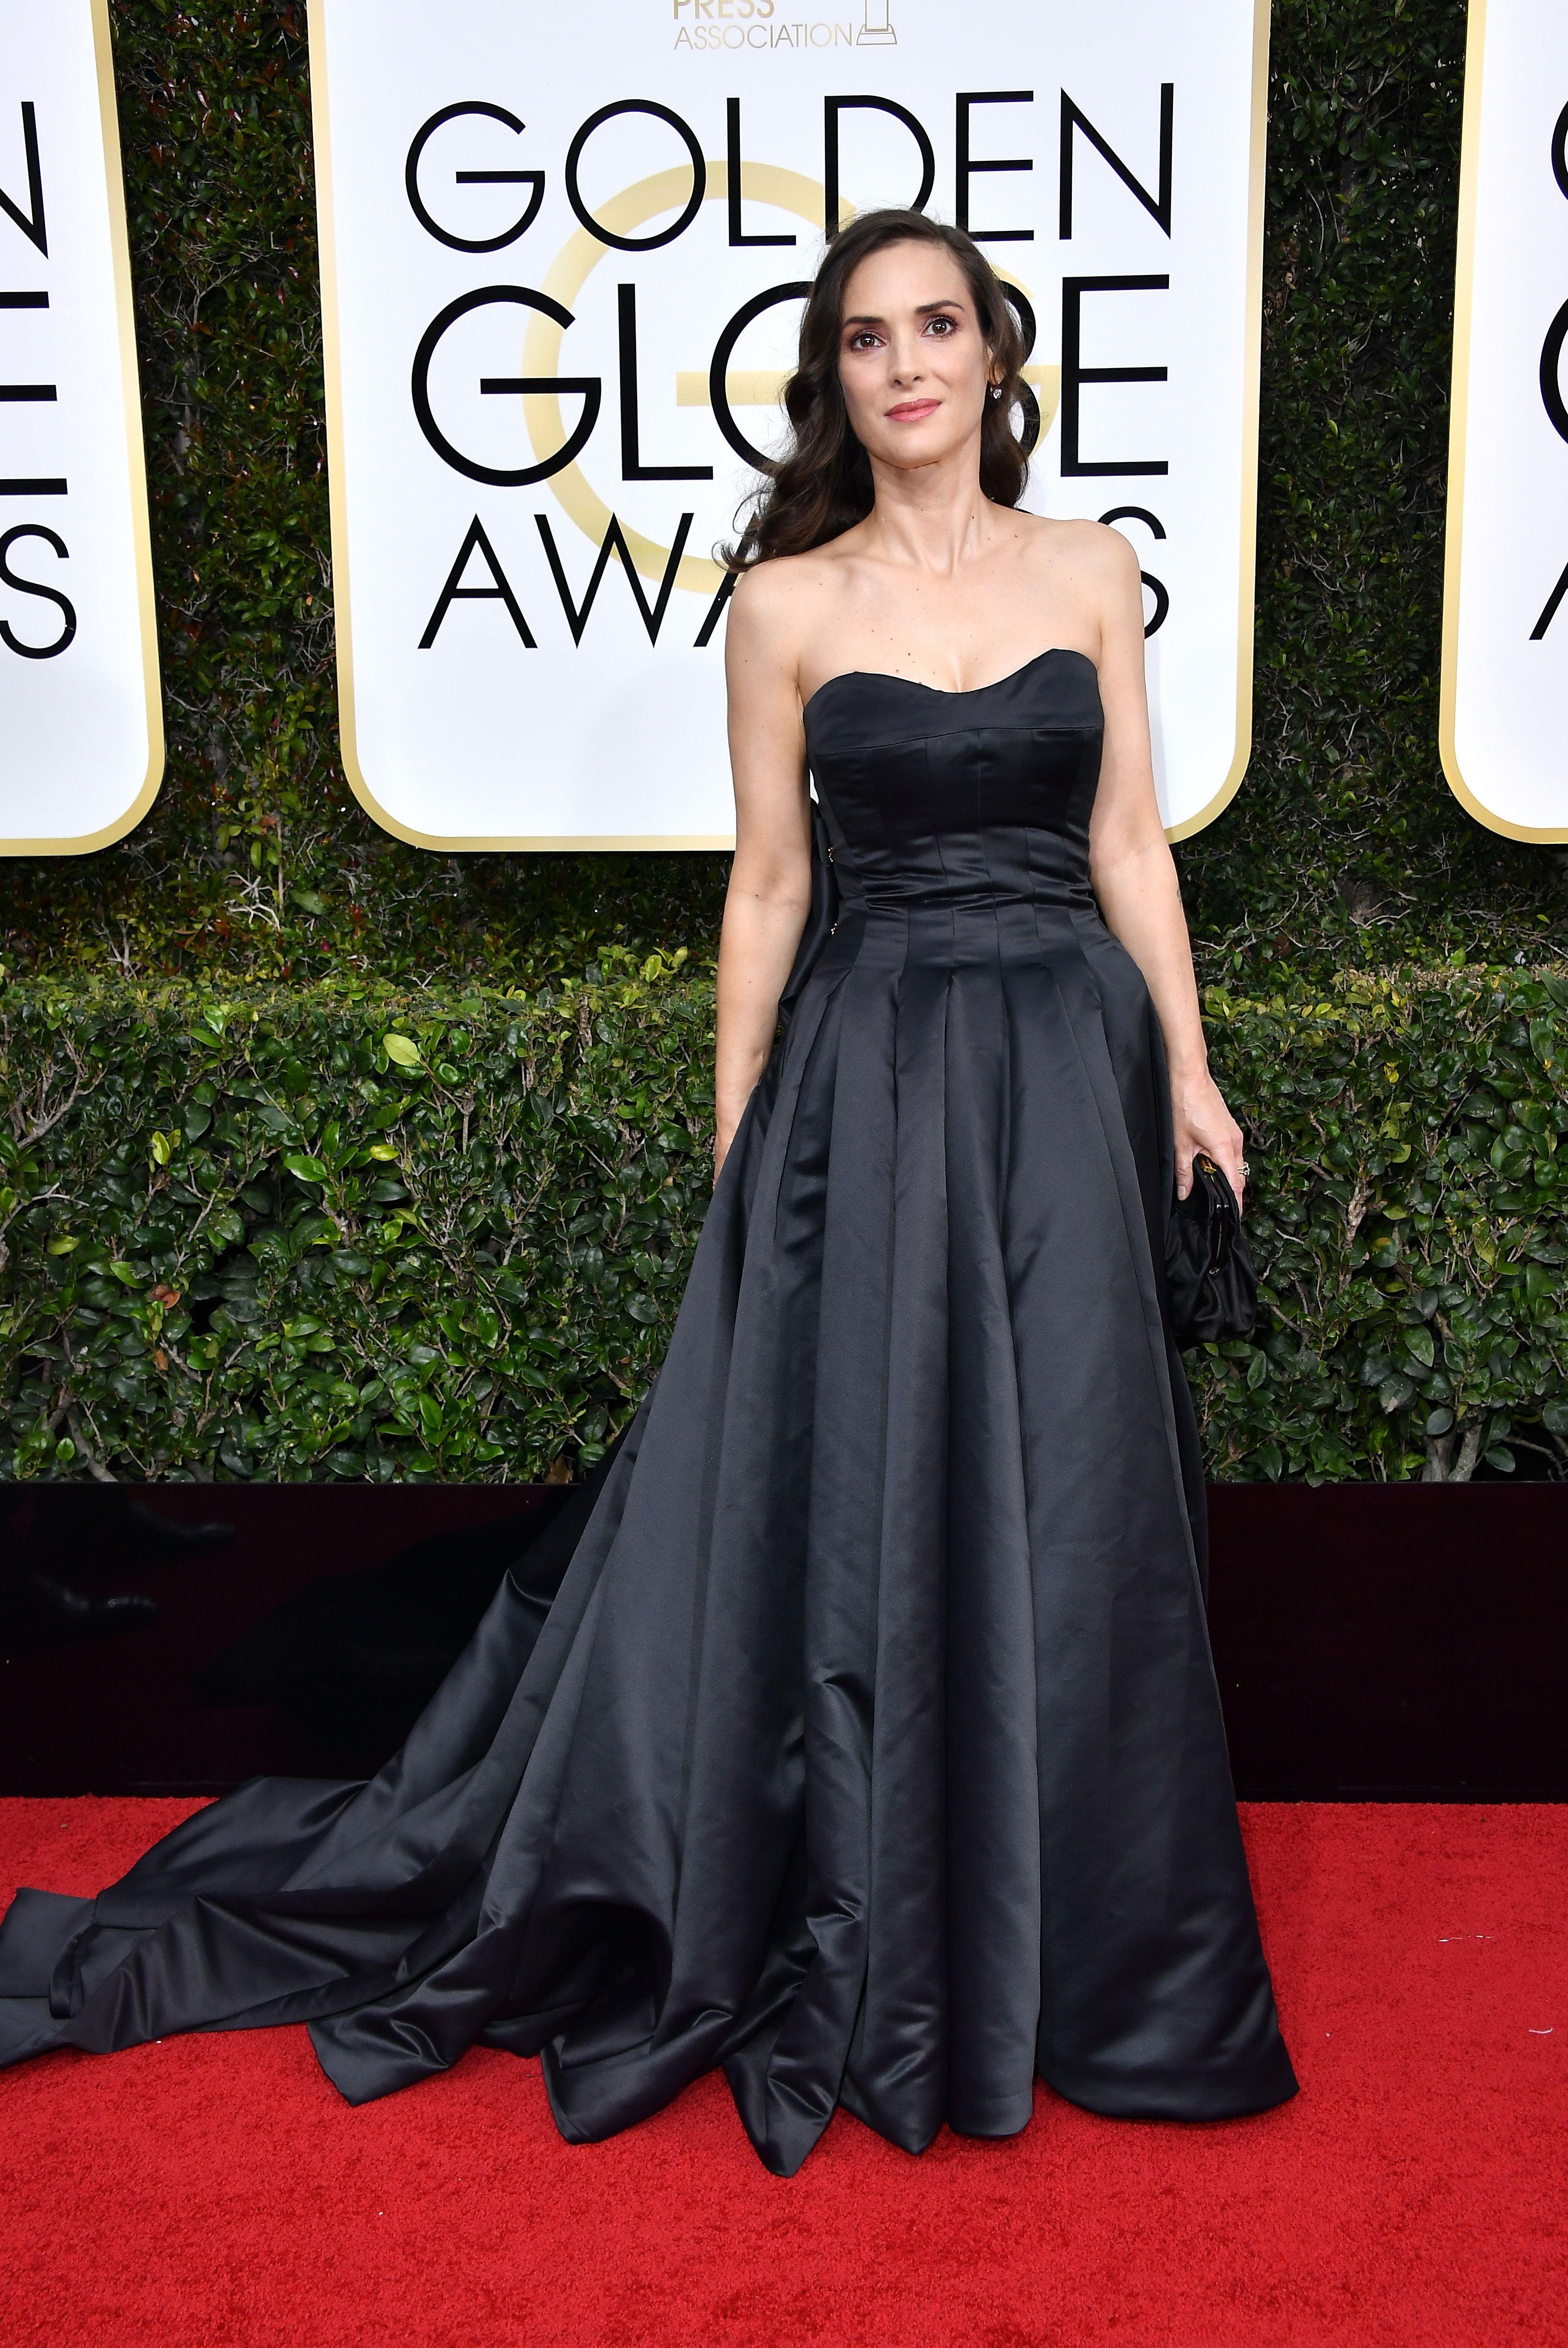 75daac620ea ... the Golden Globes 2017. Winona Ryder. Winona Ryder Winona Ryder